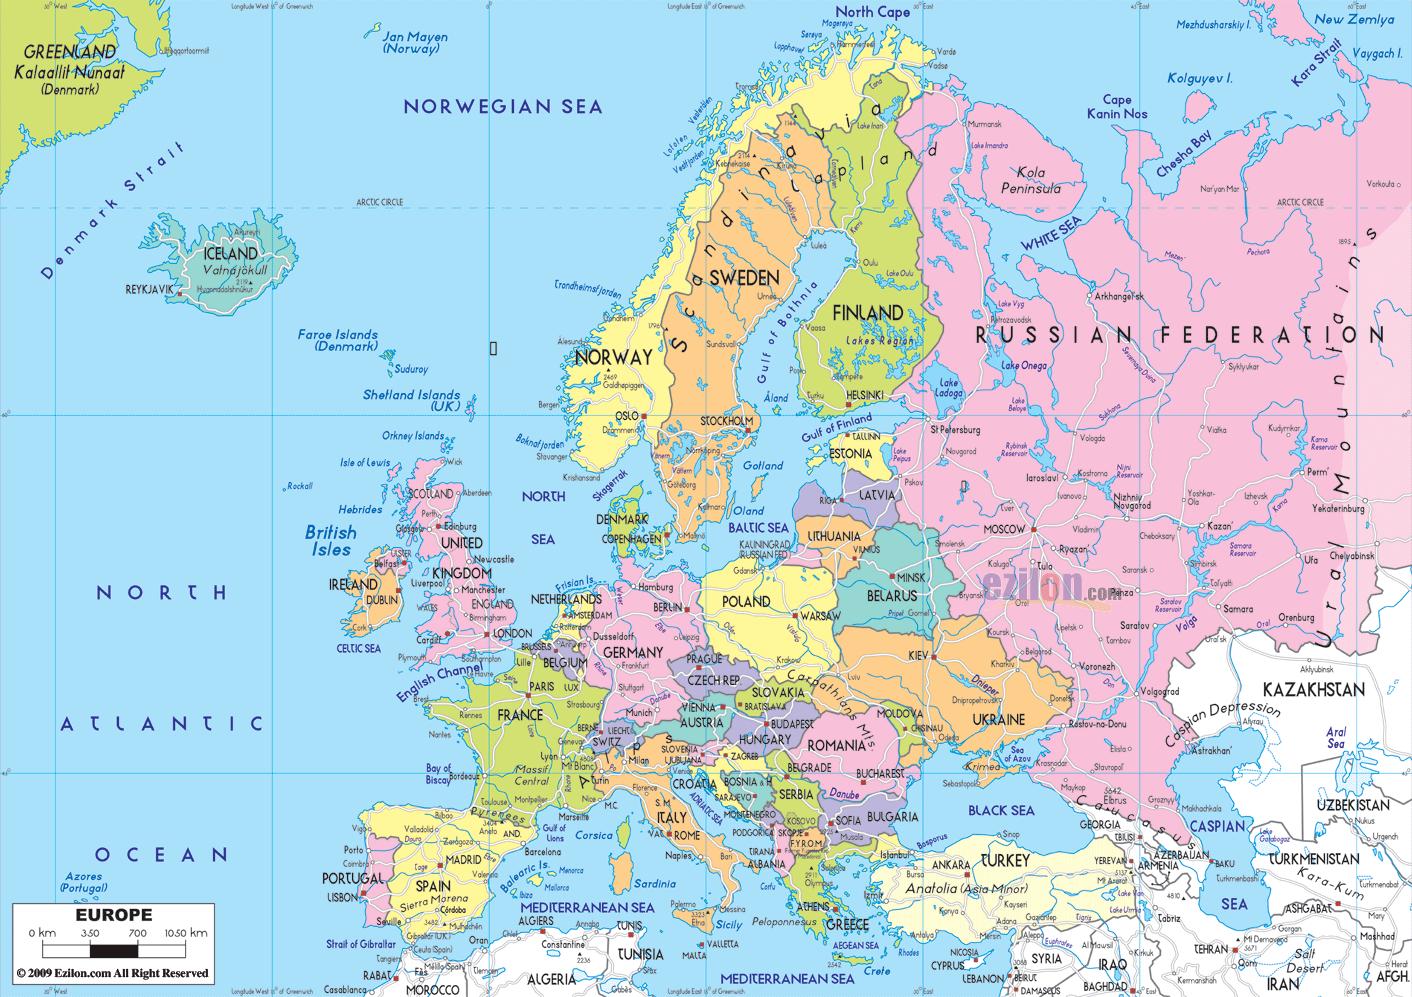 The politics of Europe